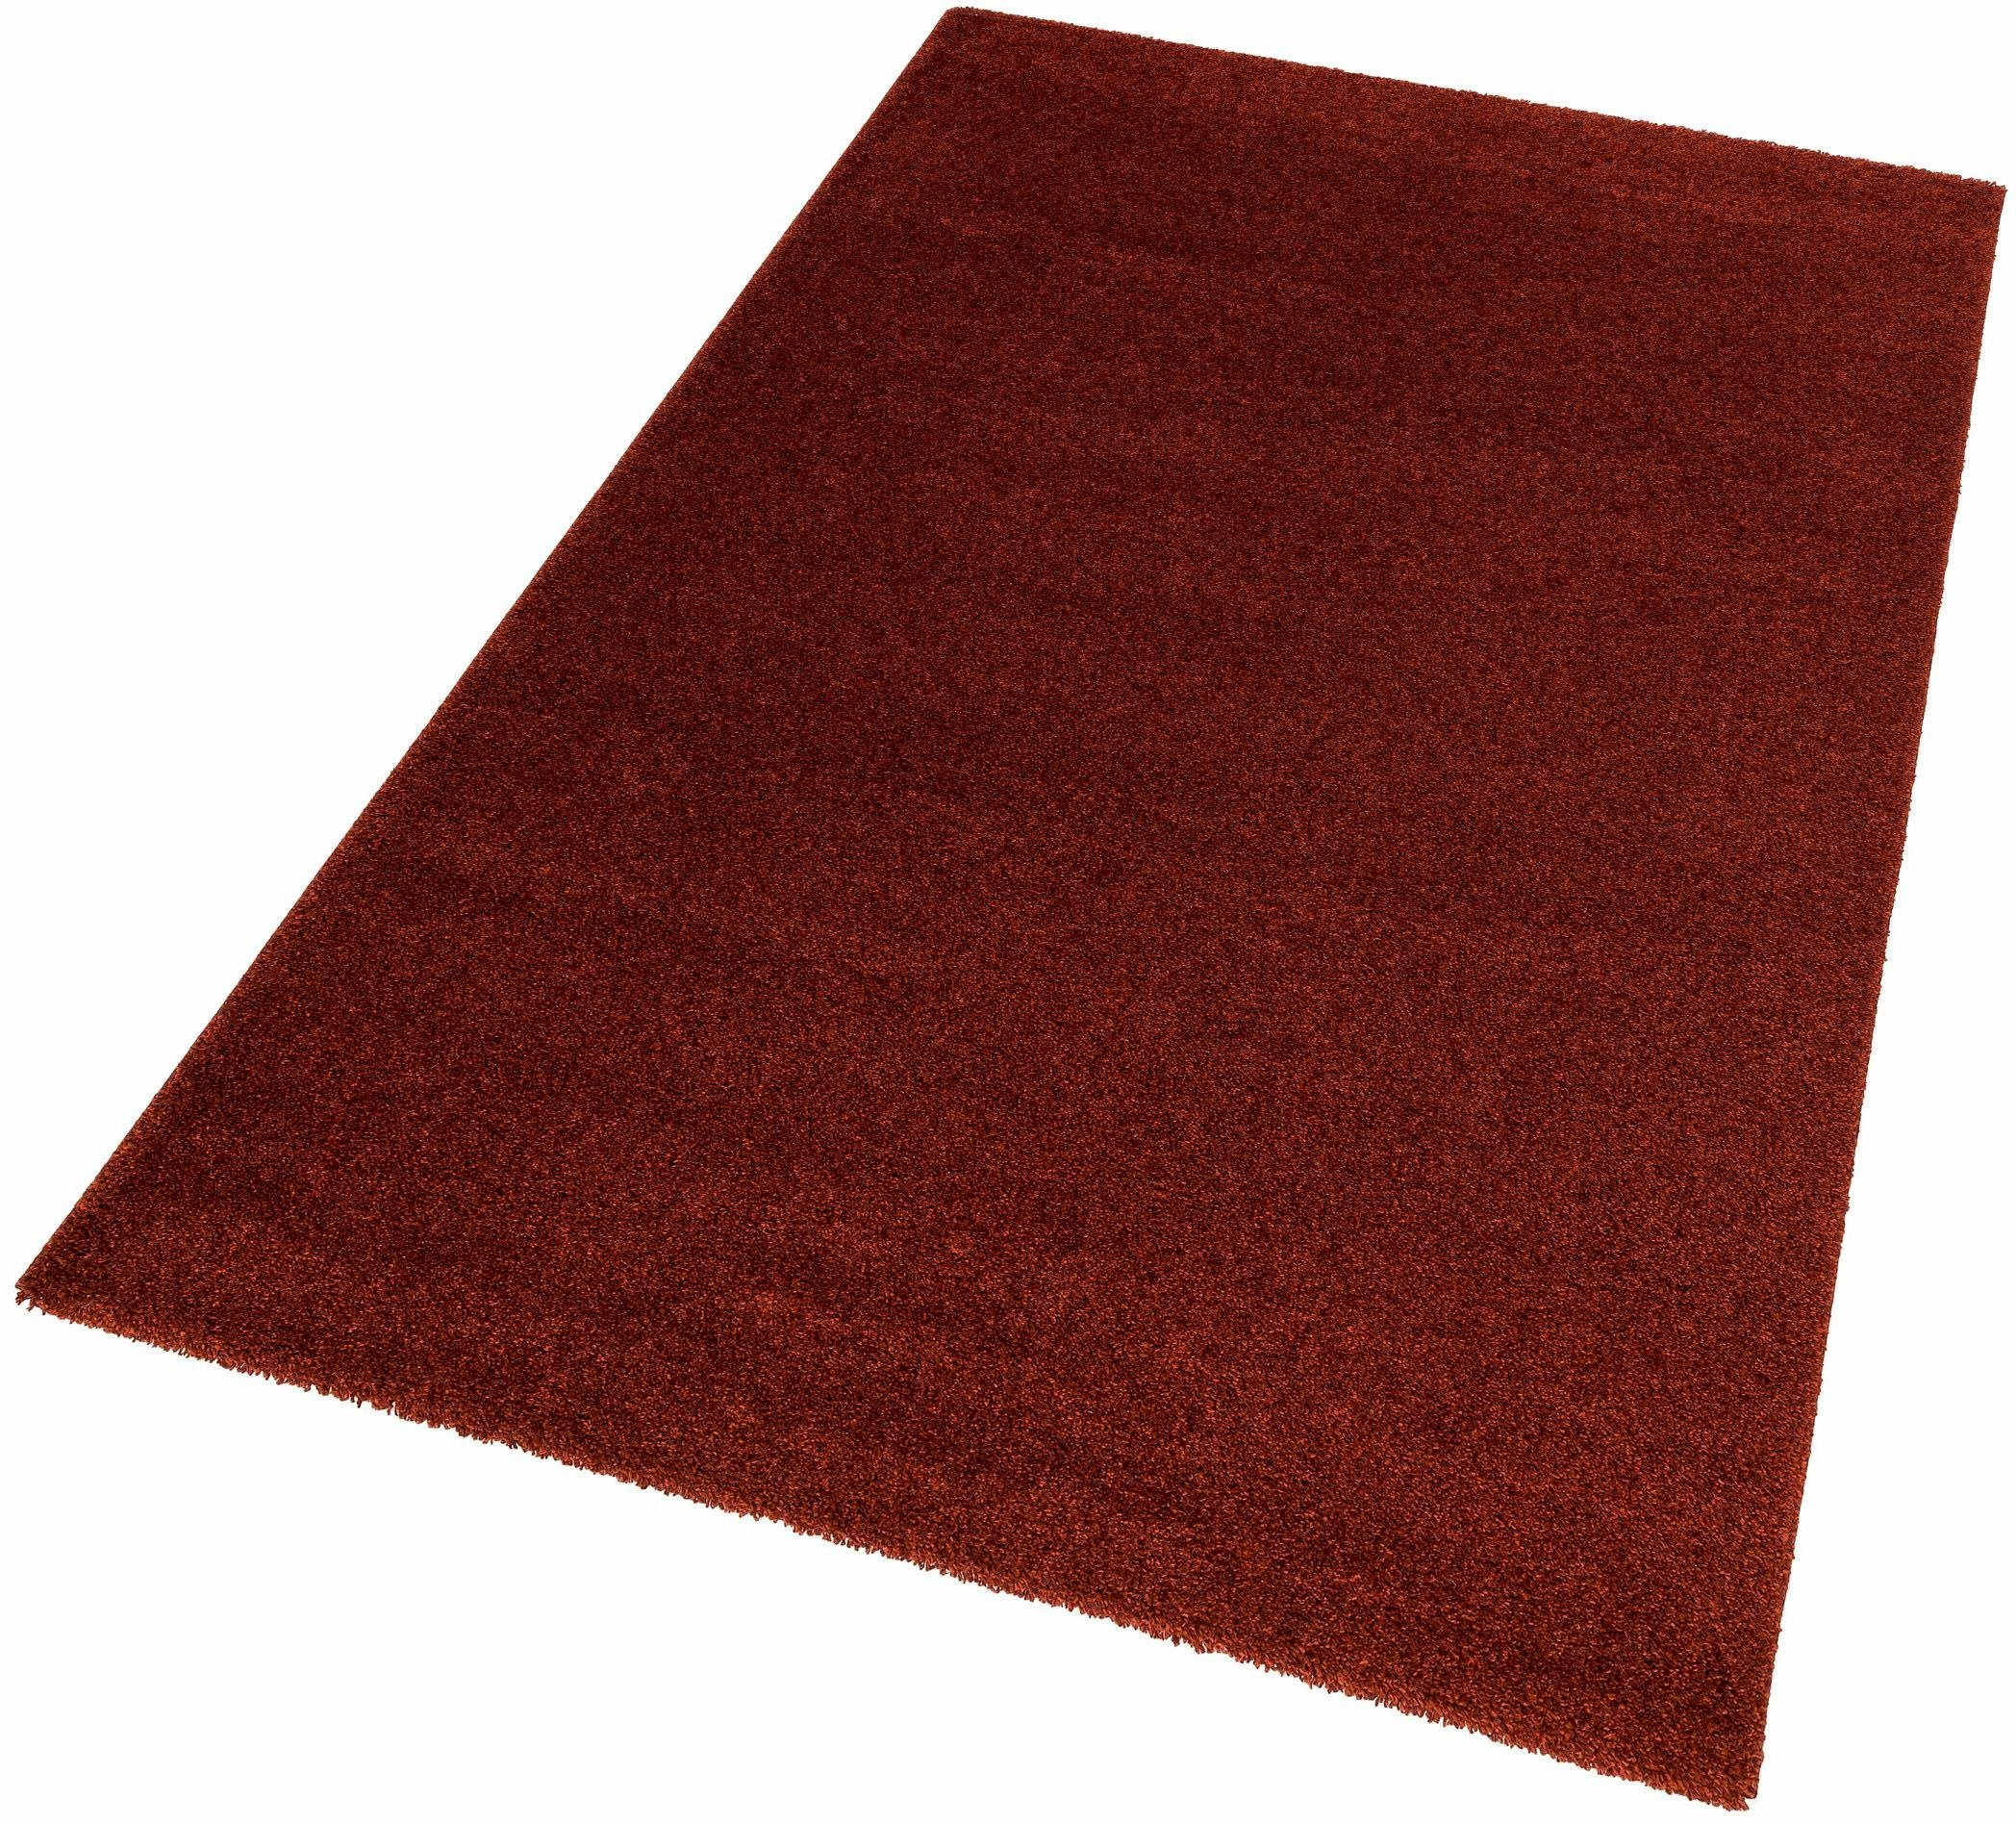 hochflor teppich riva astra rechteckig h he 25 mm rot online kaufen bei woonio. Black Bedroom Furniture Sets. Home Design Ideas